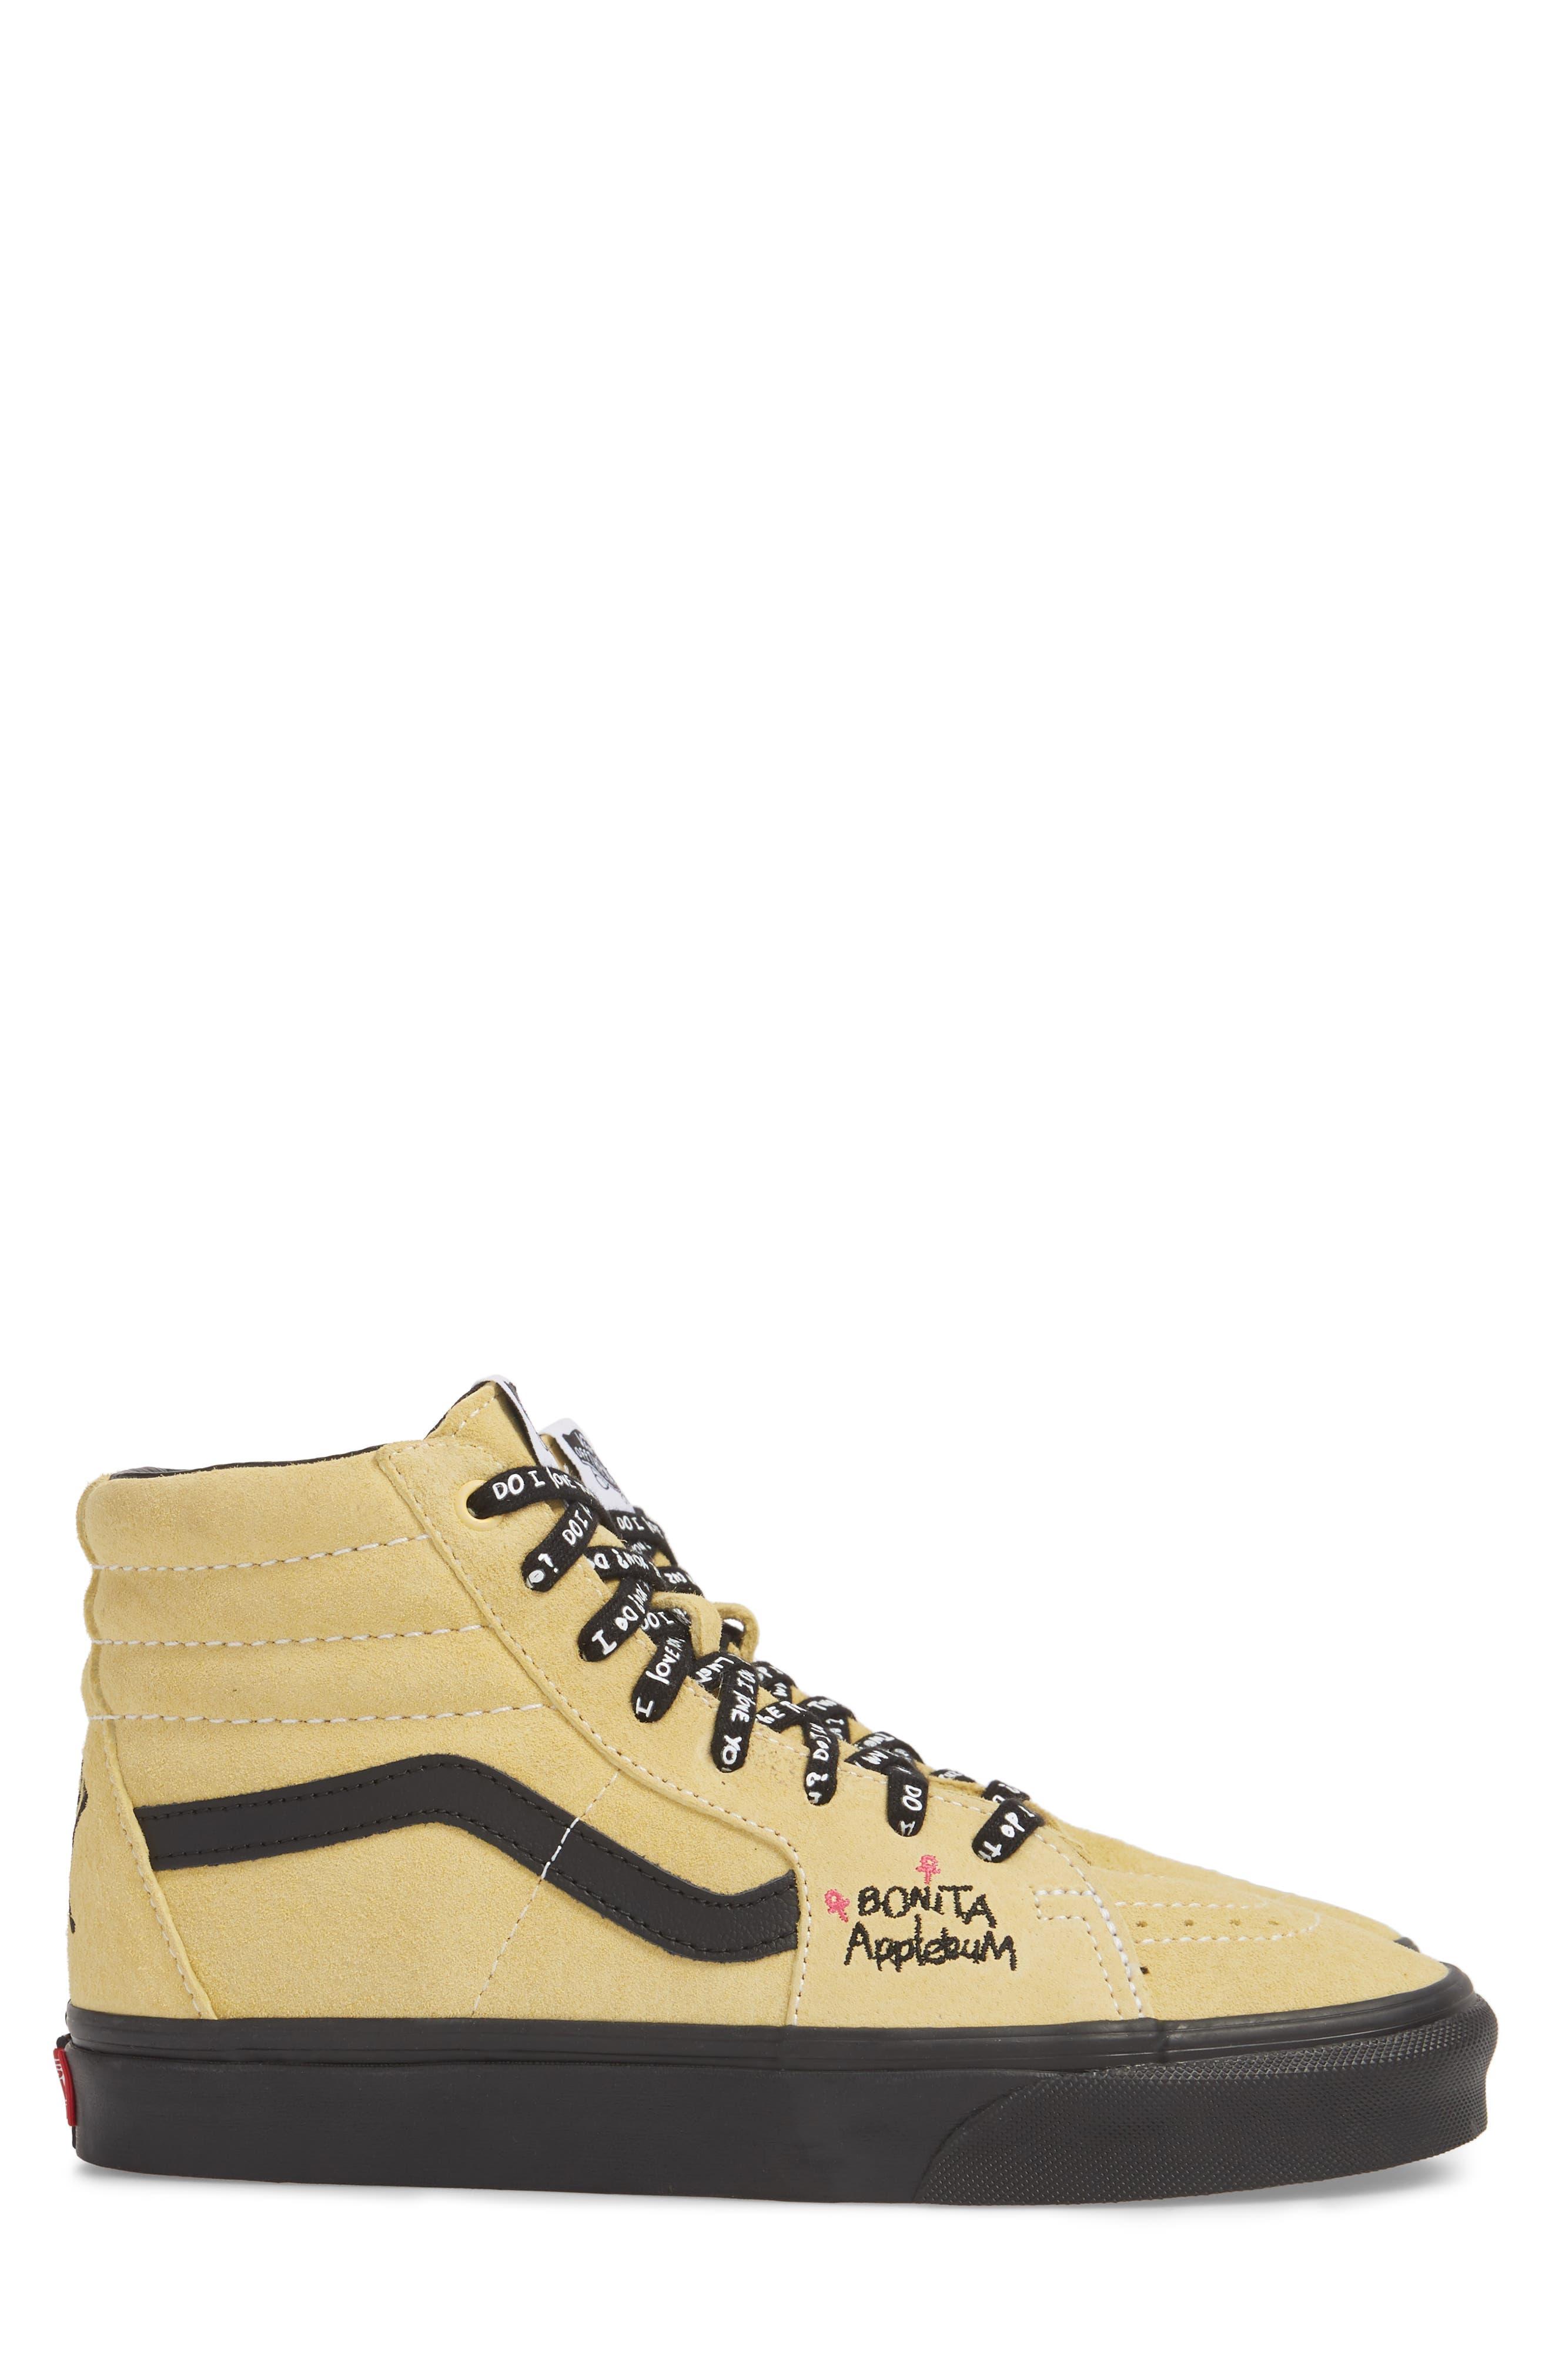 ATCQ Sk8-Hi Sneaker,                             Alternate thumbnail 3, color,                             Mellow Yellow/ Spectra Yellow